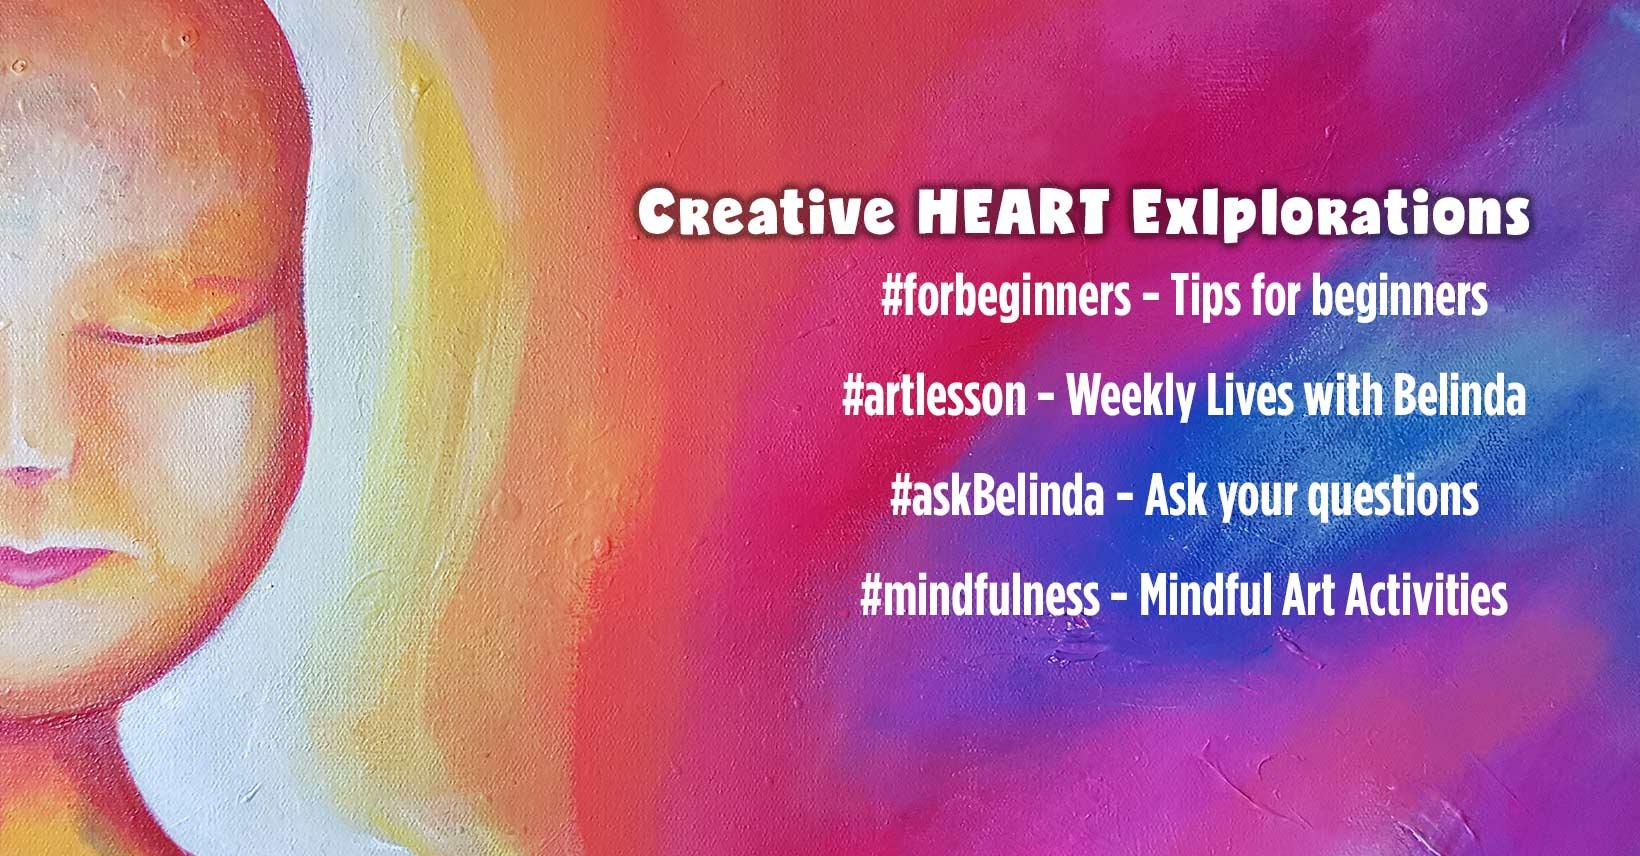 Creative Heart Explorations